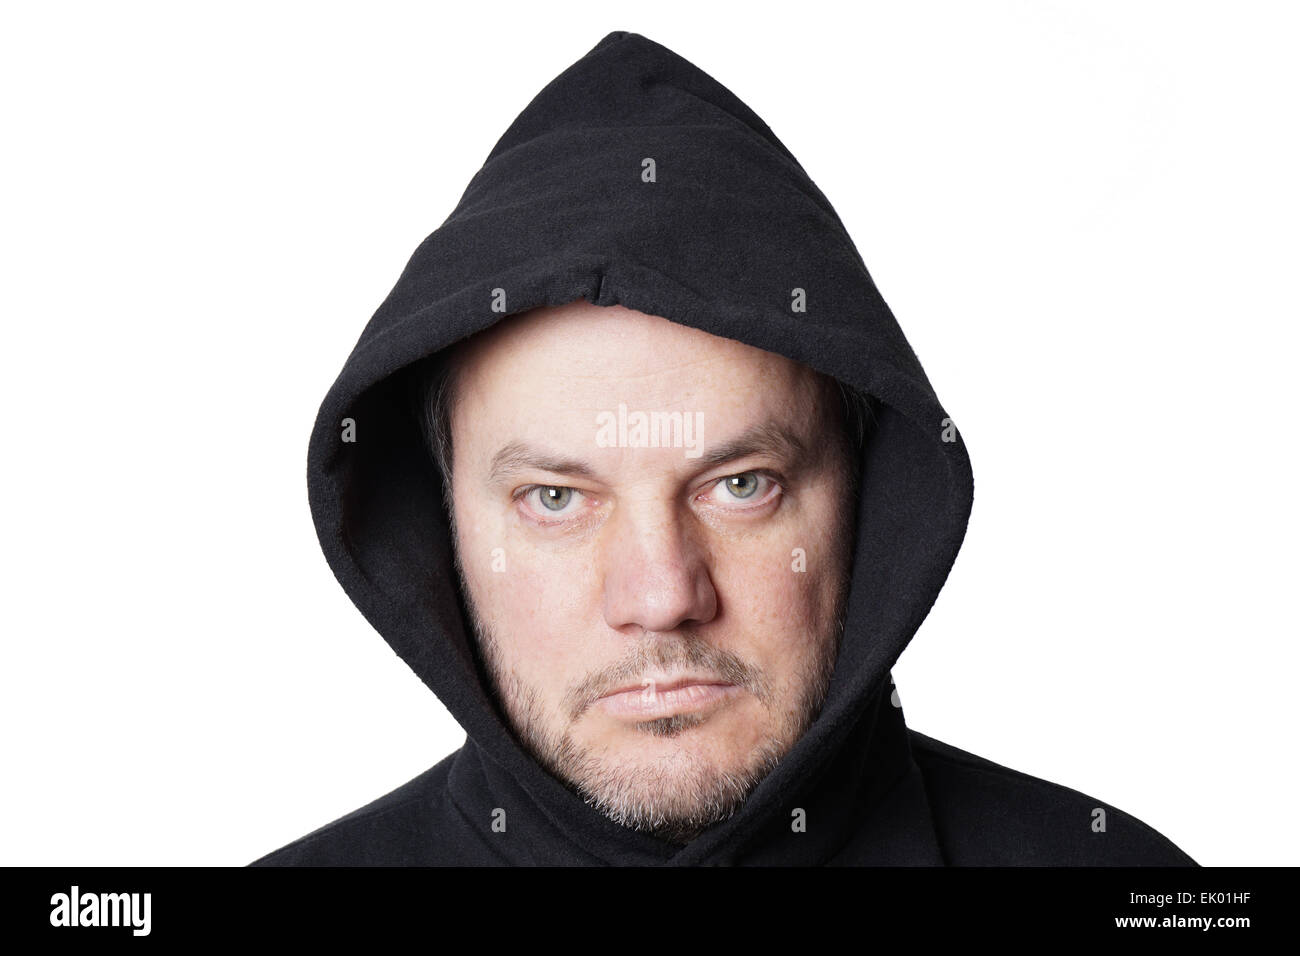 man wearing black hoodie - Stock Image